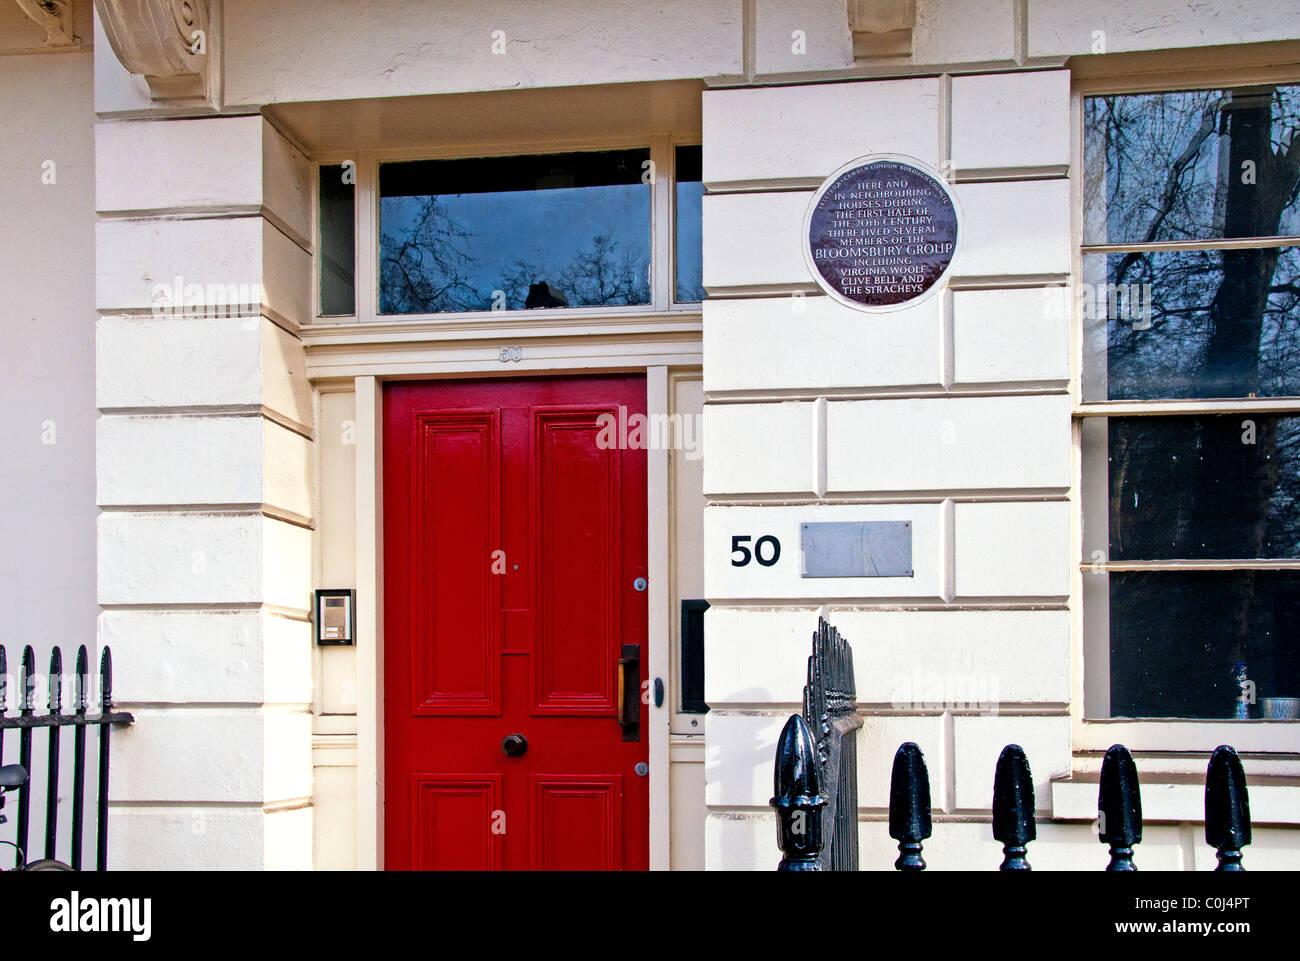 Case in Bloomsbury, Londra; Haus a Bloomsbury, Gordon Square, Wohnhaus der Bloomsbury Gruppe Foto Stock